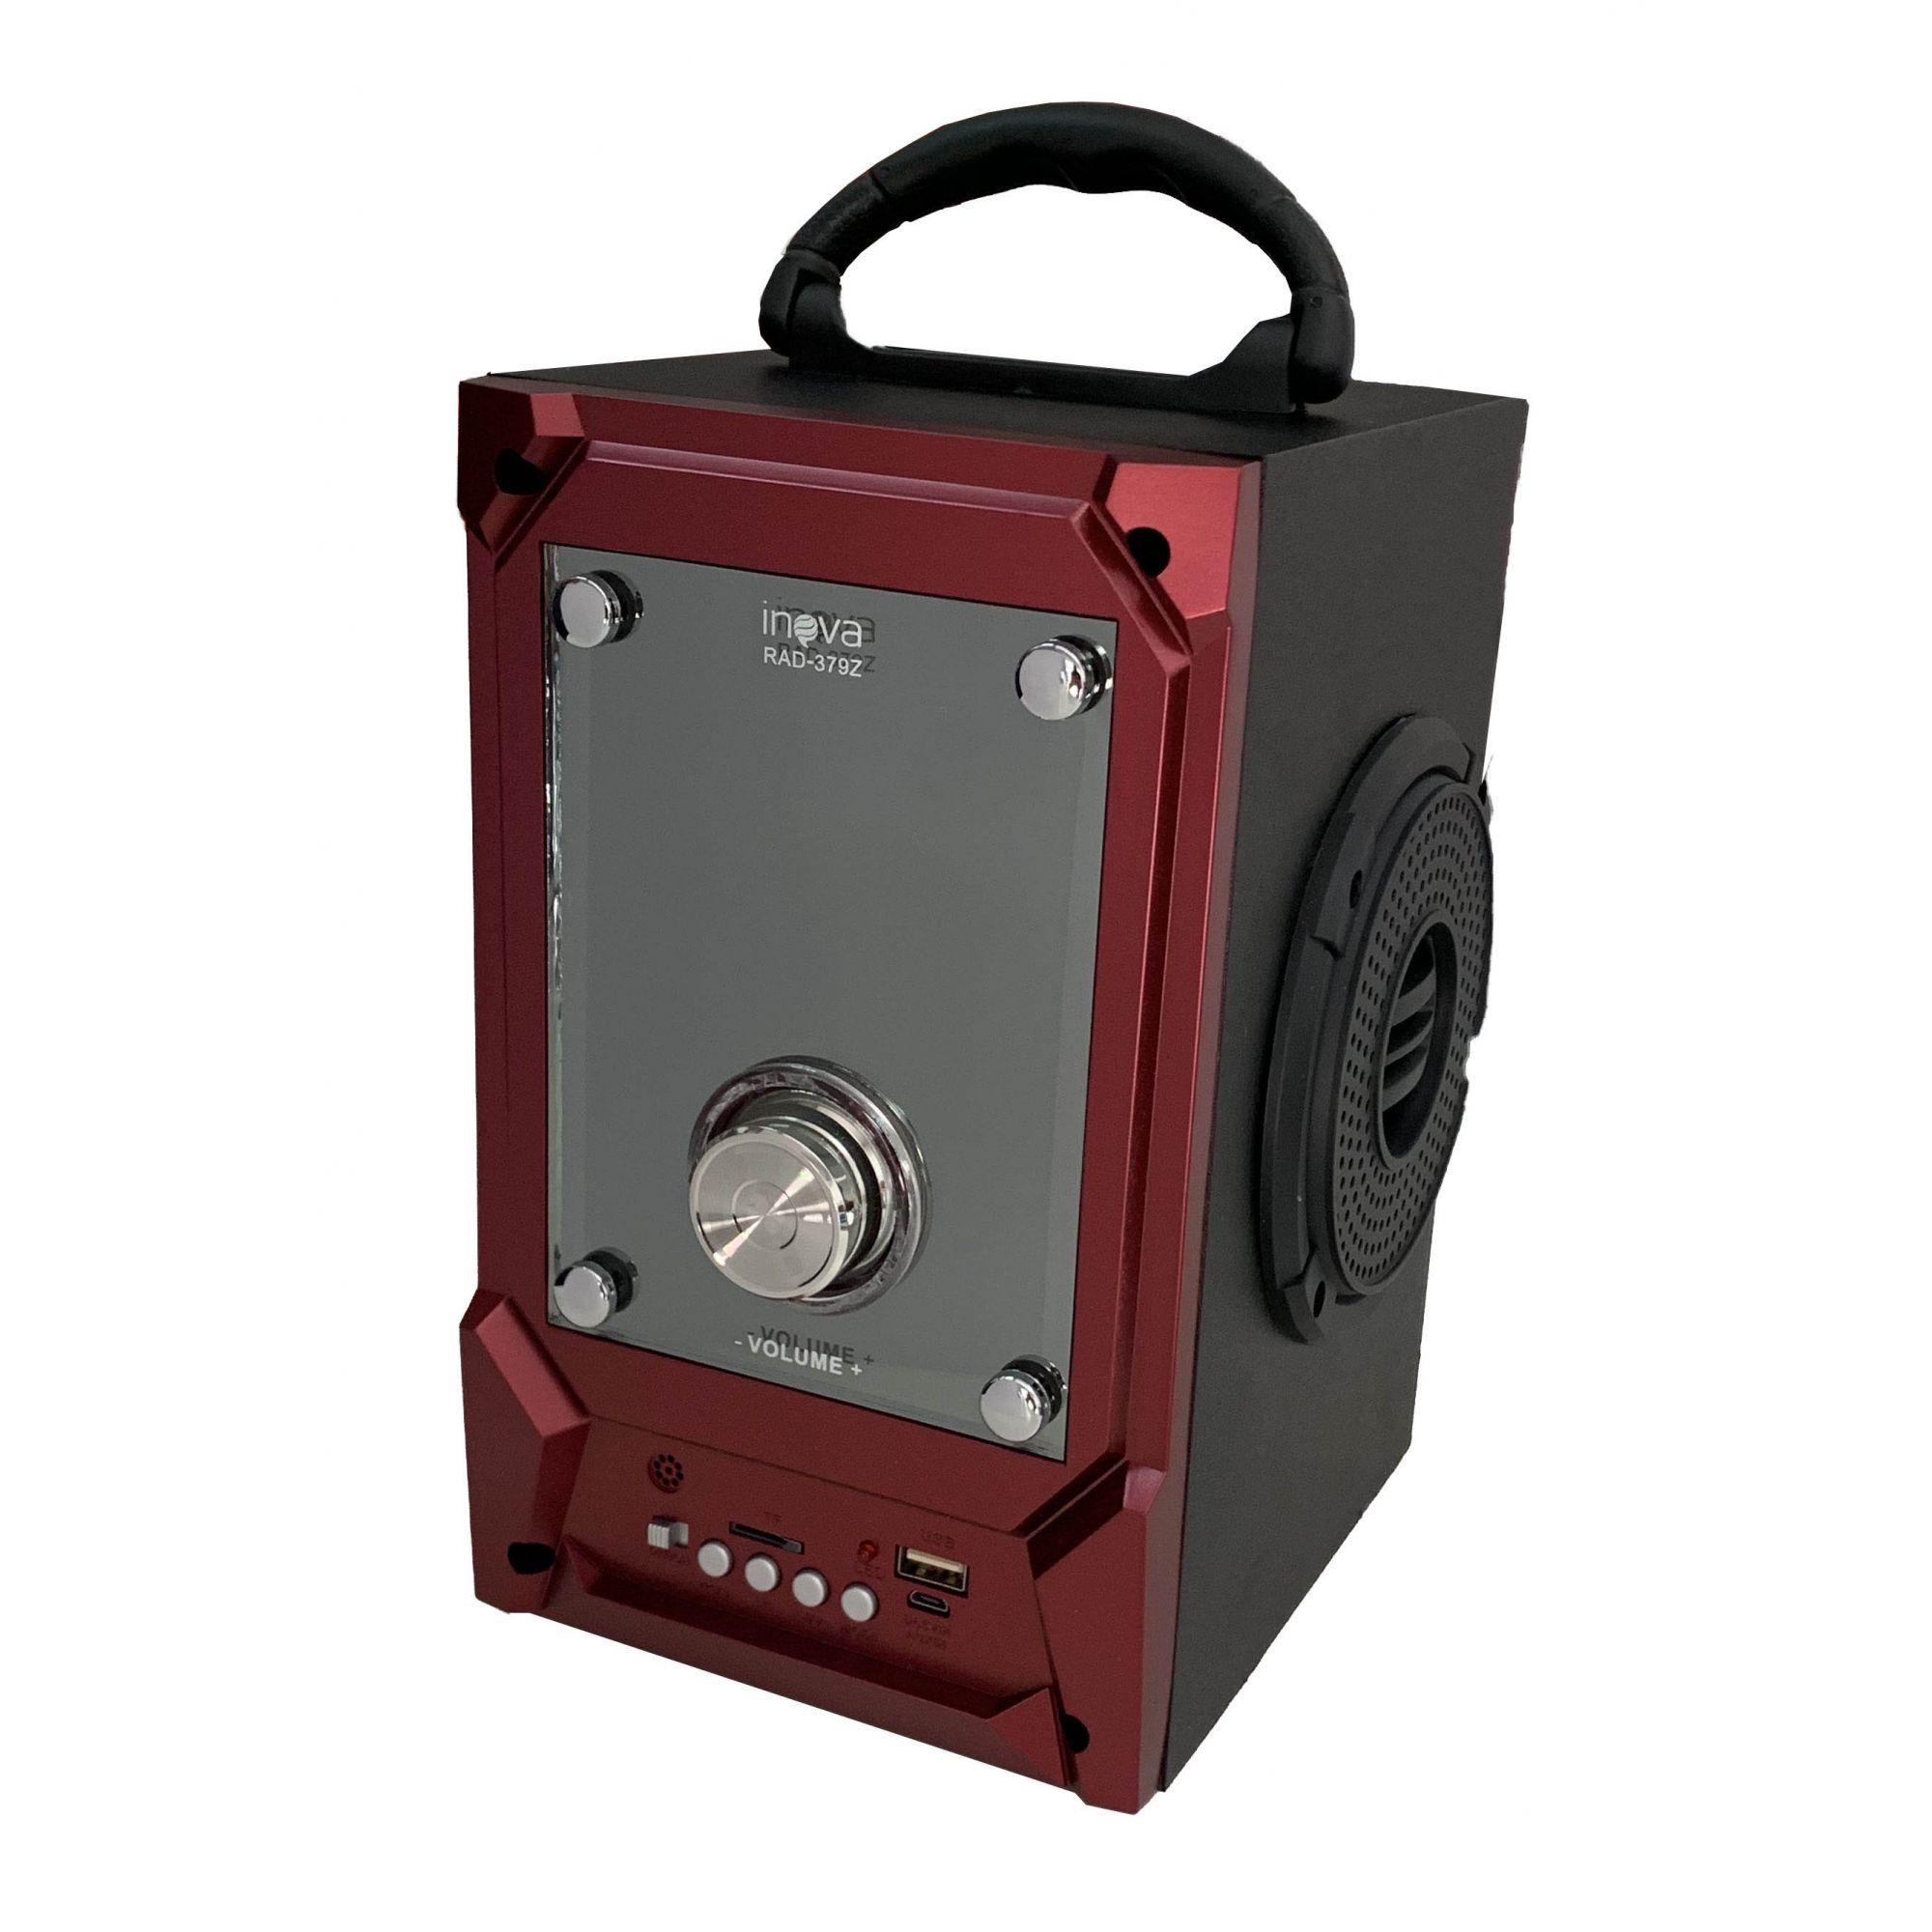 Caixa de som Inova RAD-379Z